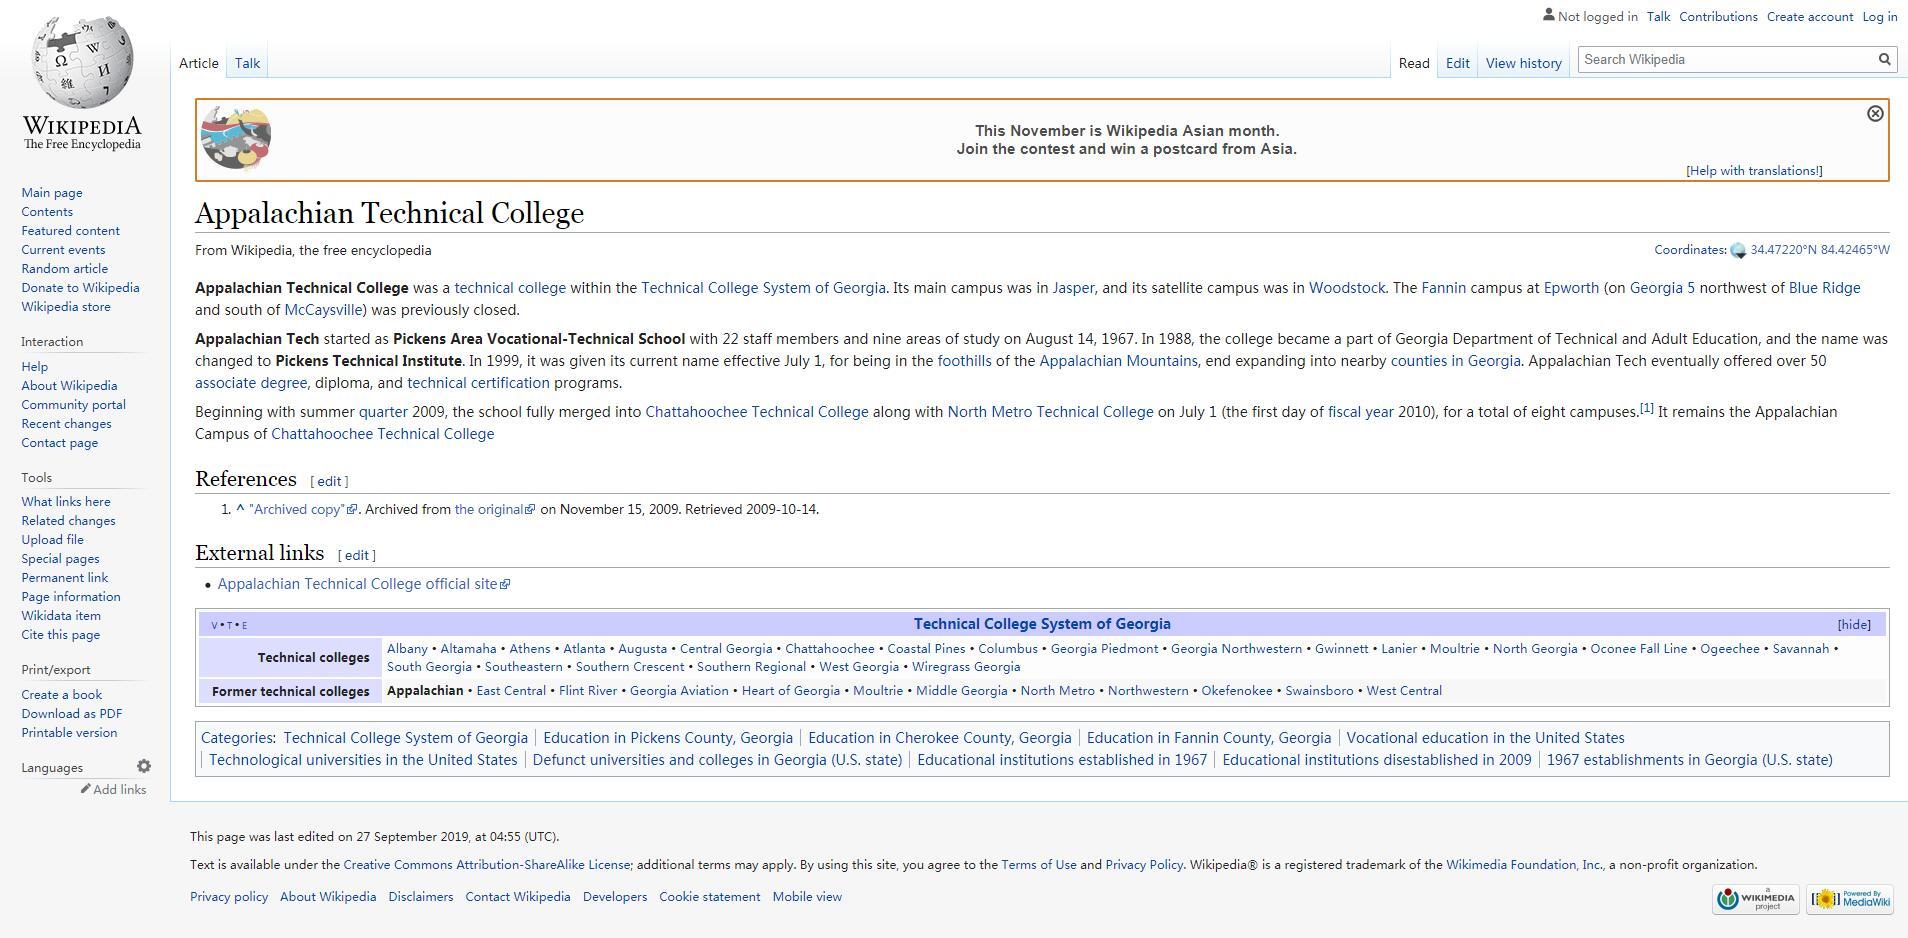 Appalachian Technical College